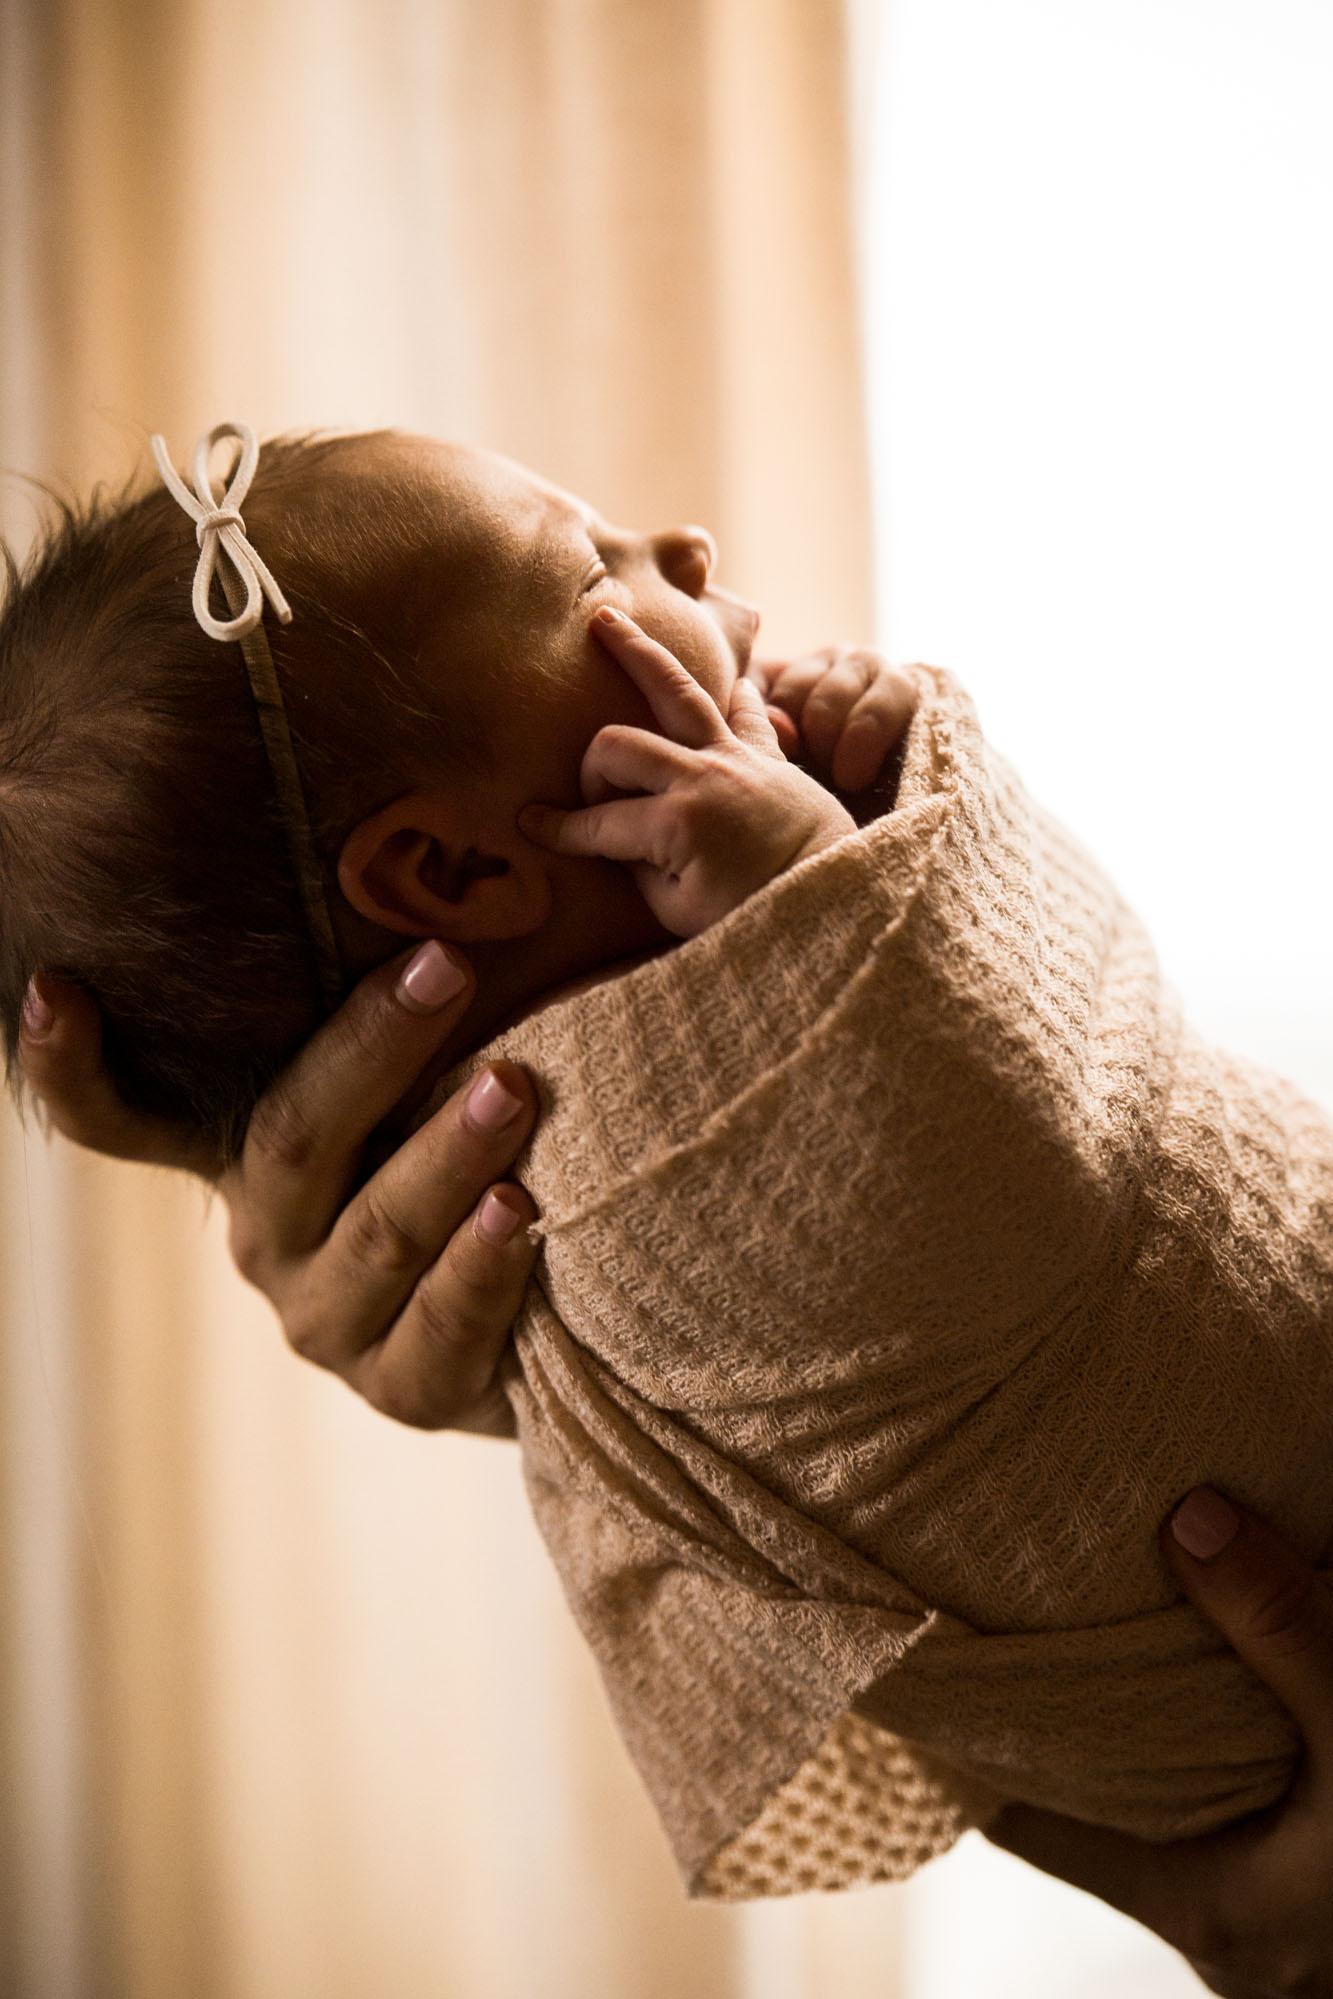 Calgary newborn photographer - in-home lifestyle newborn photography